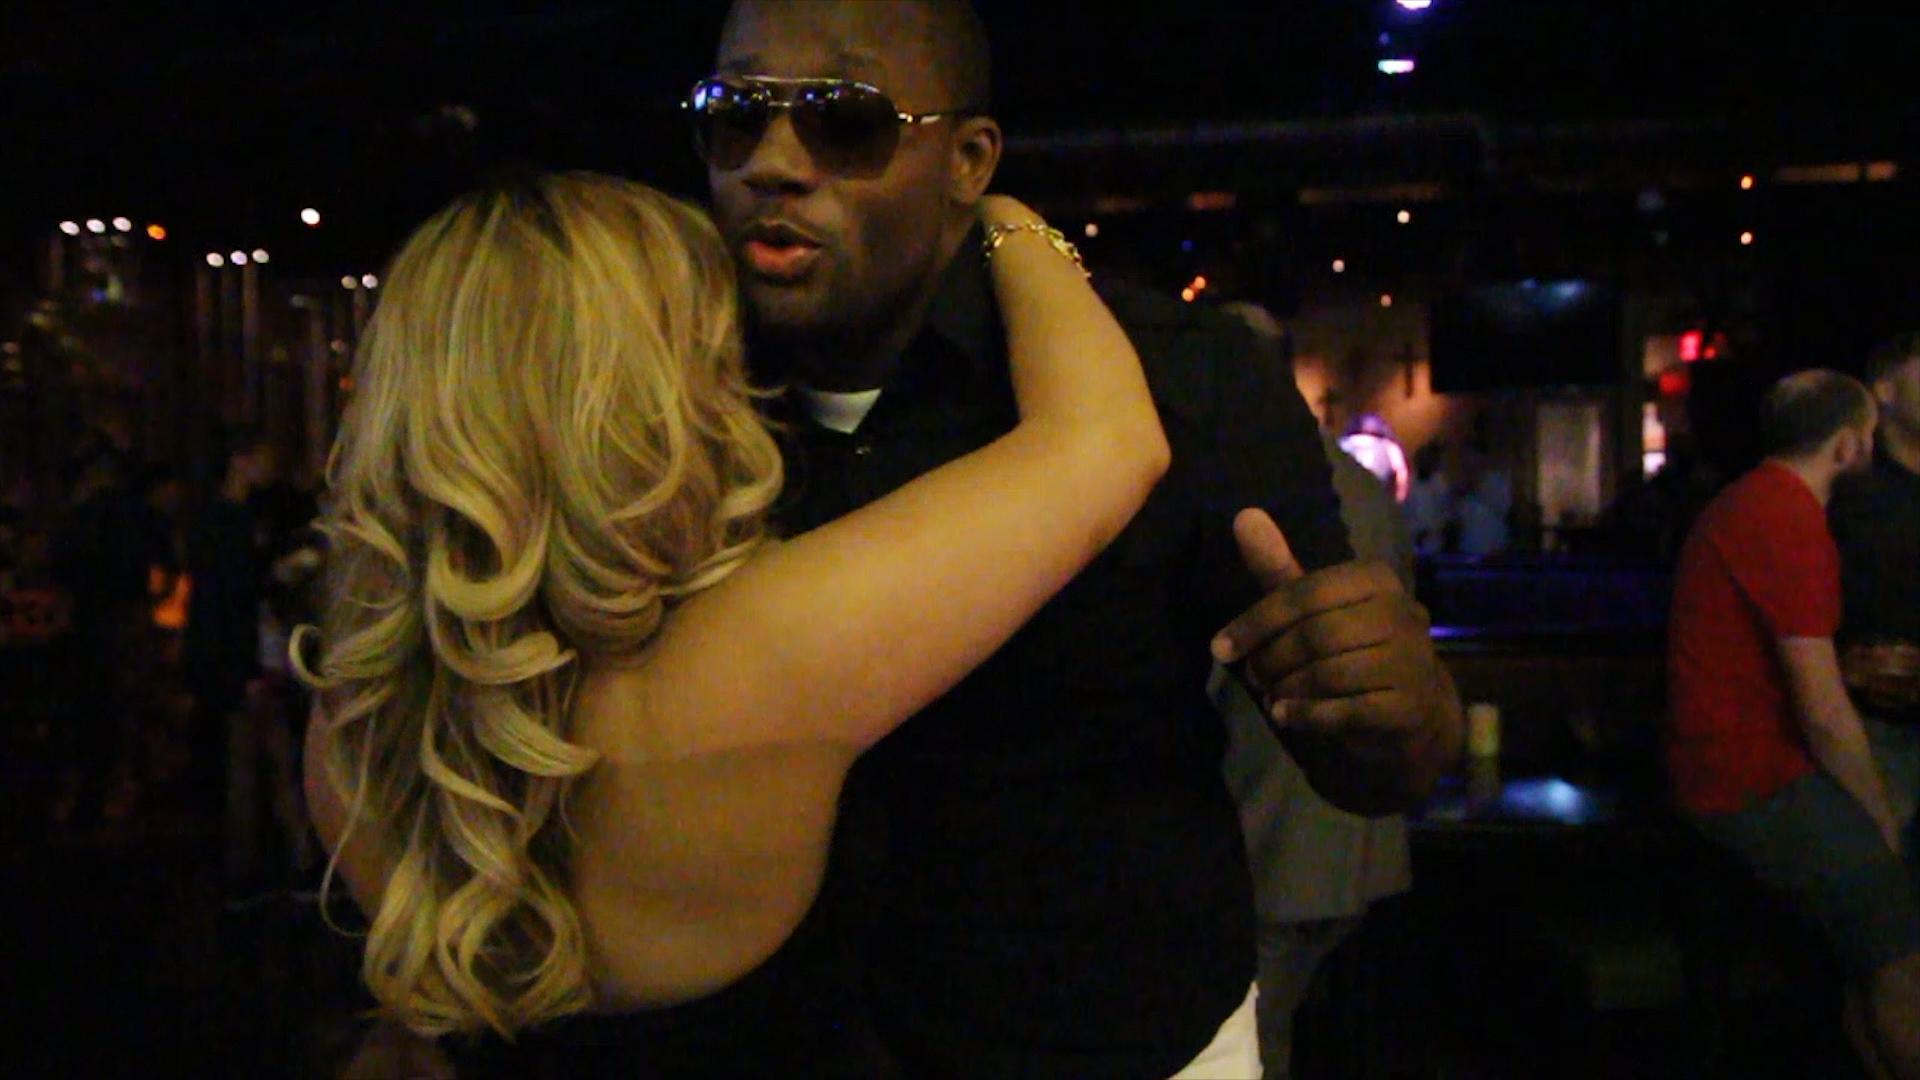 Anthony & Blond Woman Dancing.jpg